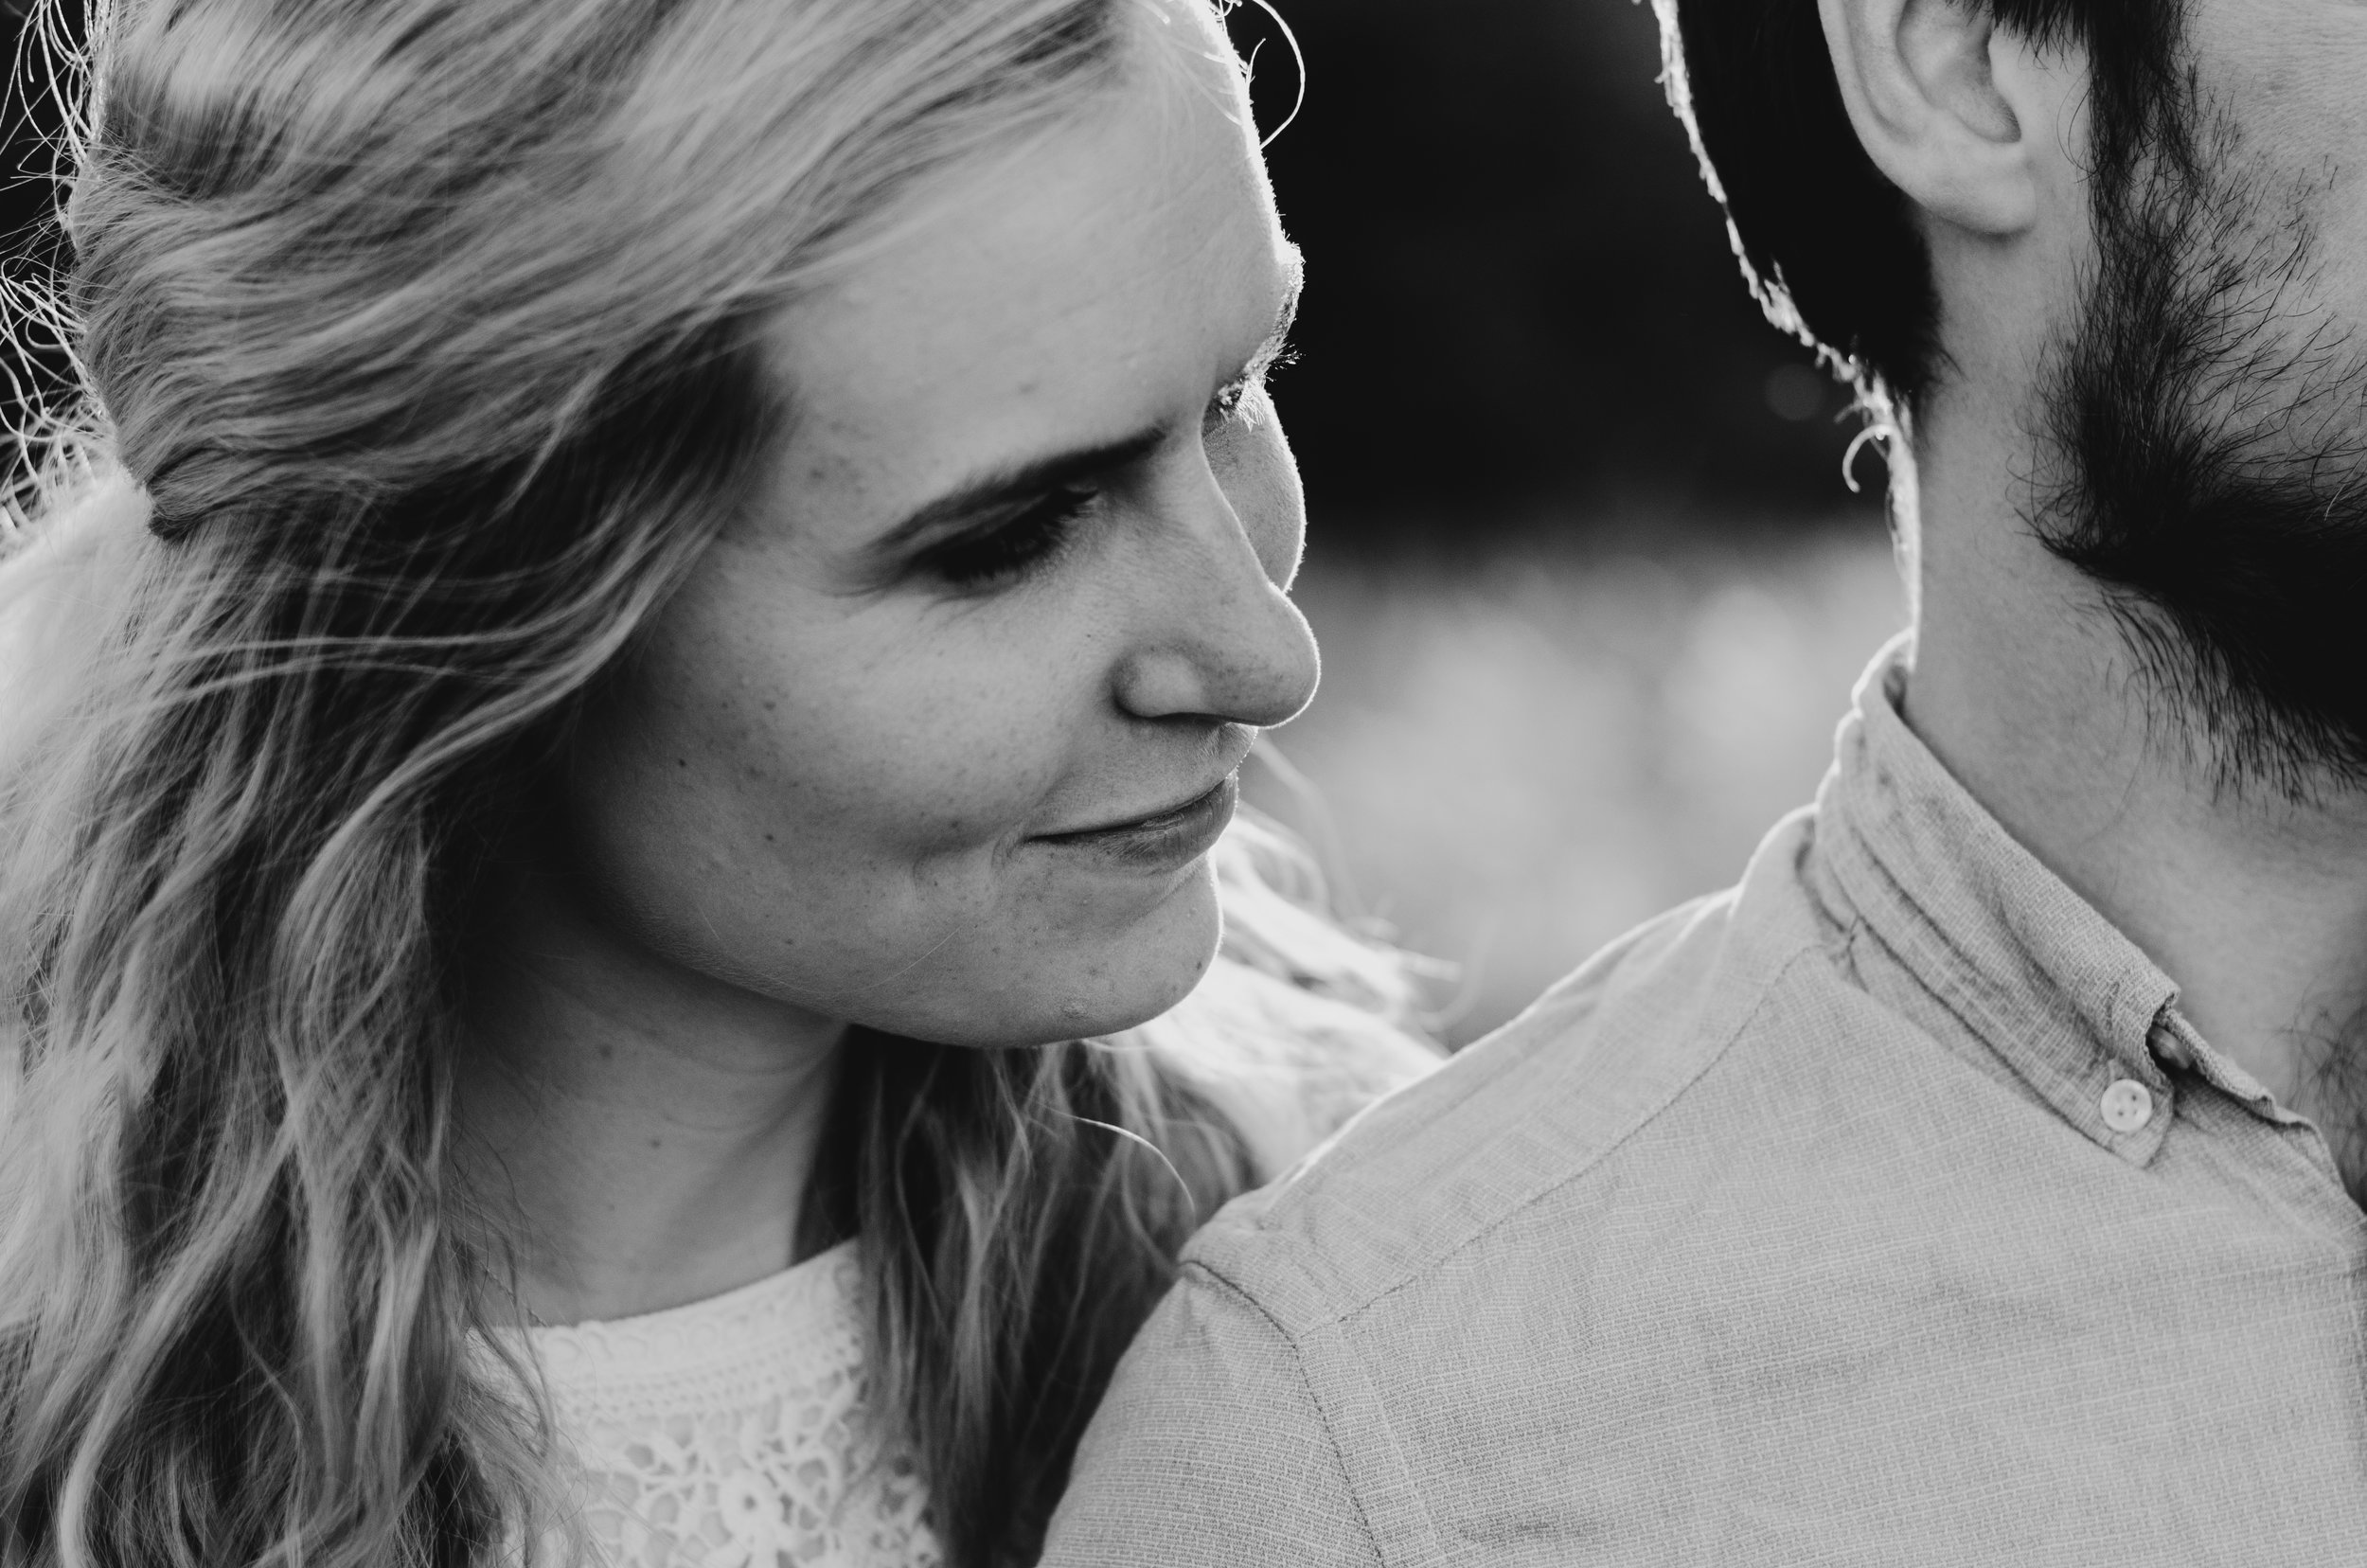 Gina & Chris - Barcombe Mills - Couple Session - Aiste Saulyte Photography-31.jpg